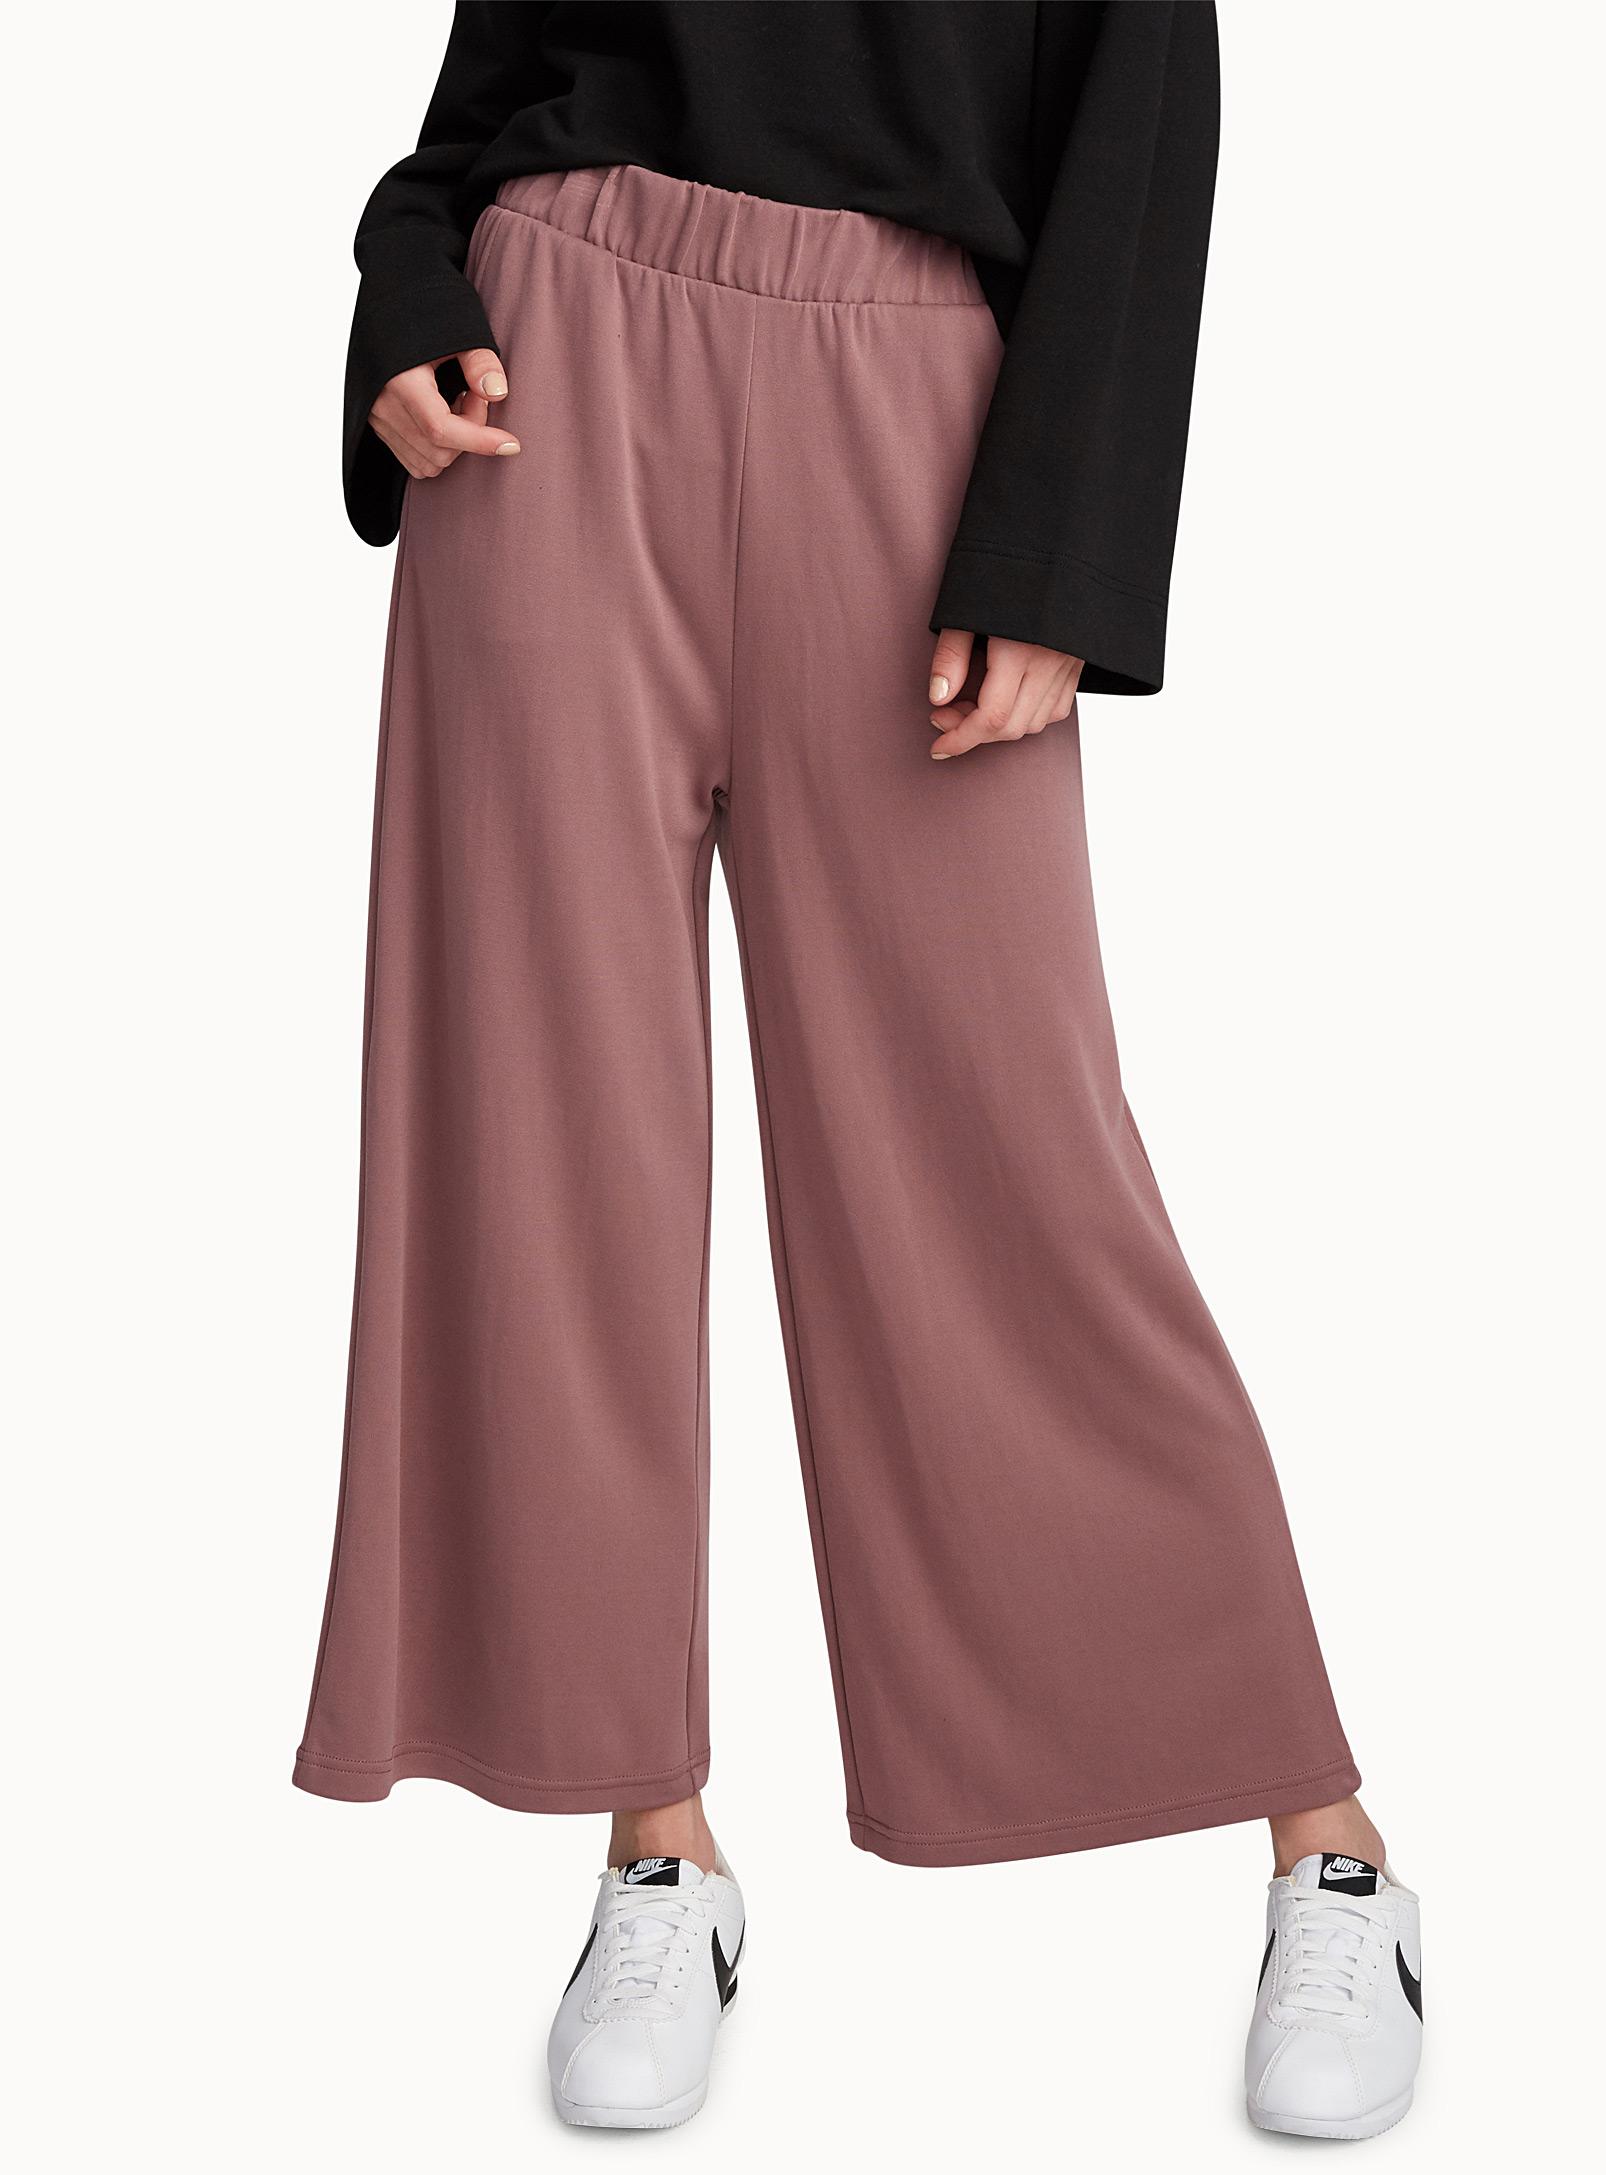 pantalon, mode, été